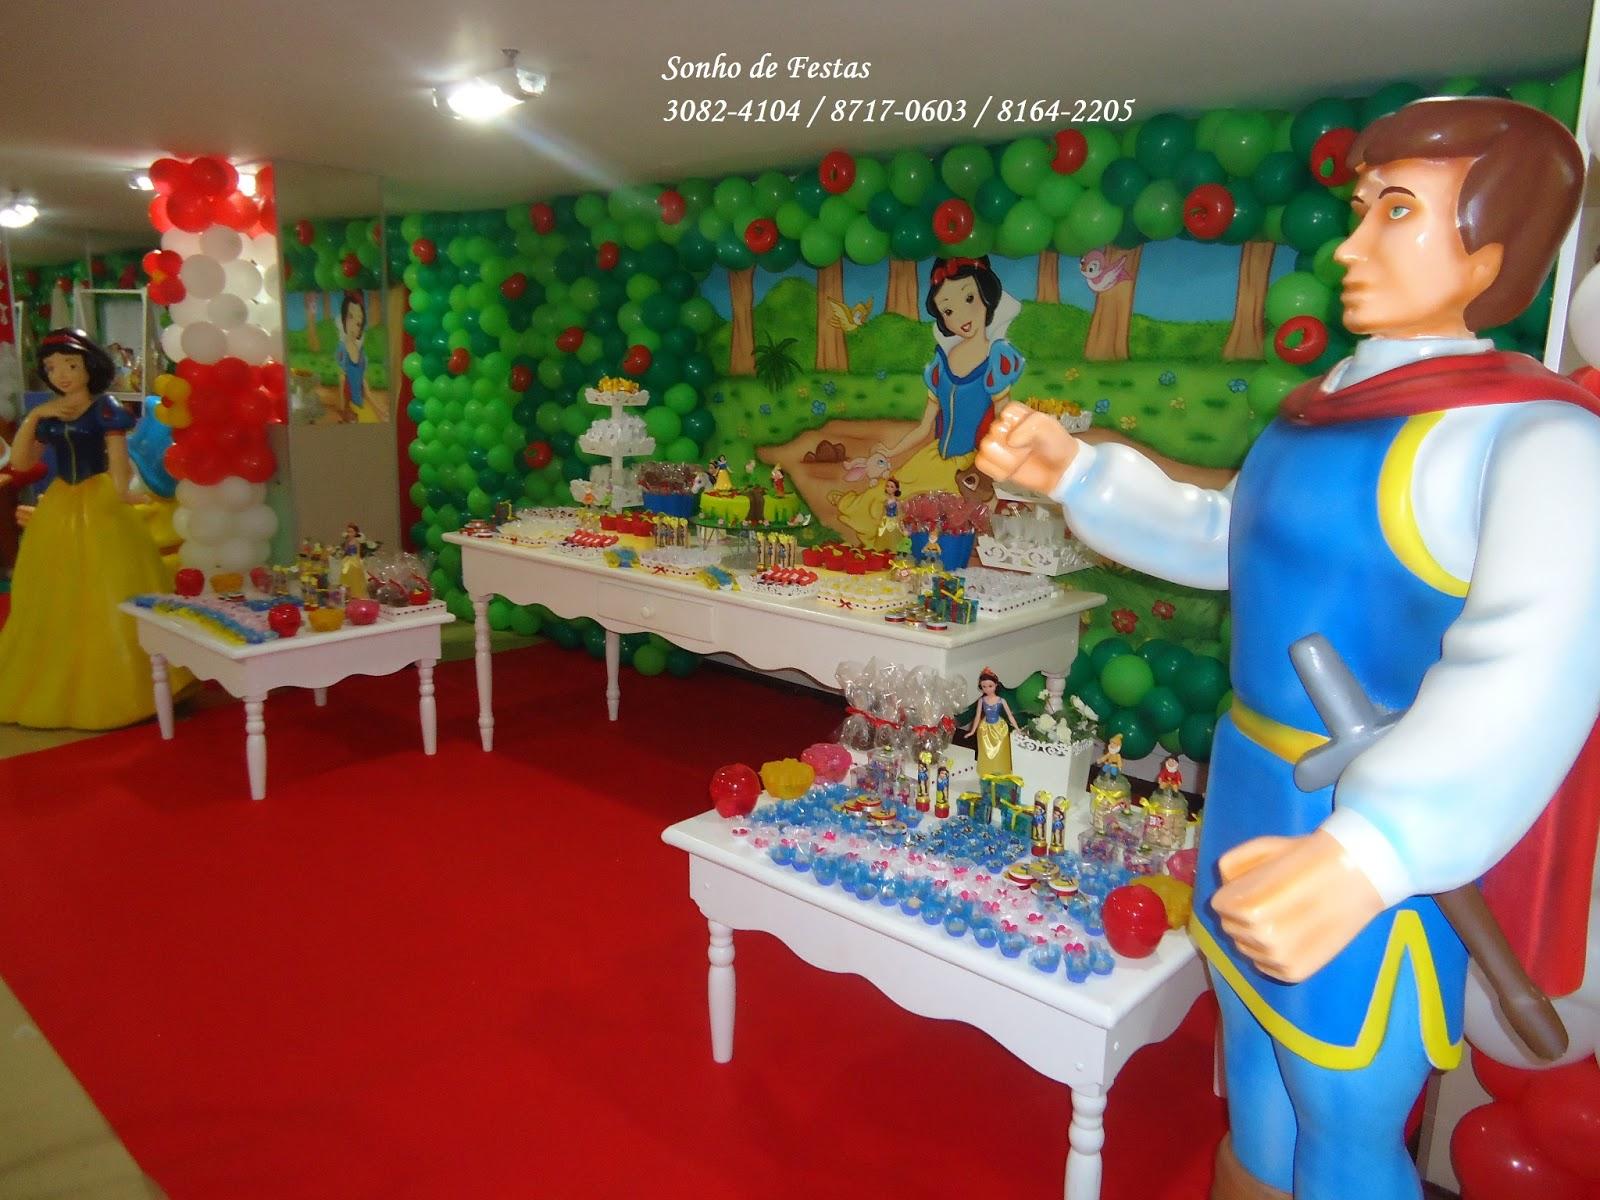 decoracao festa branca de neve provencal:Sonho de Festas: Festa provençal Branca de Neve com Fibras